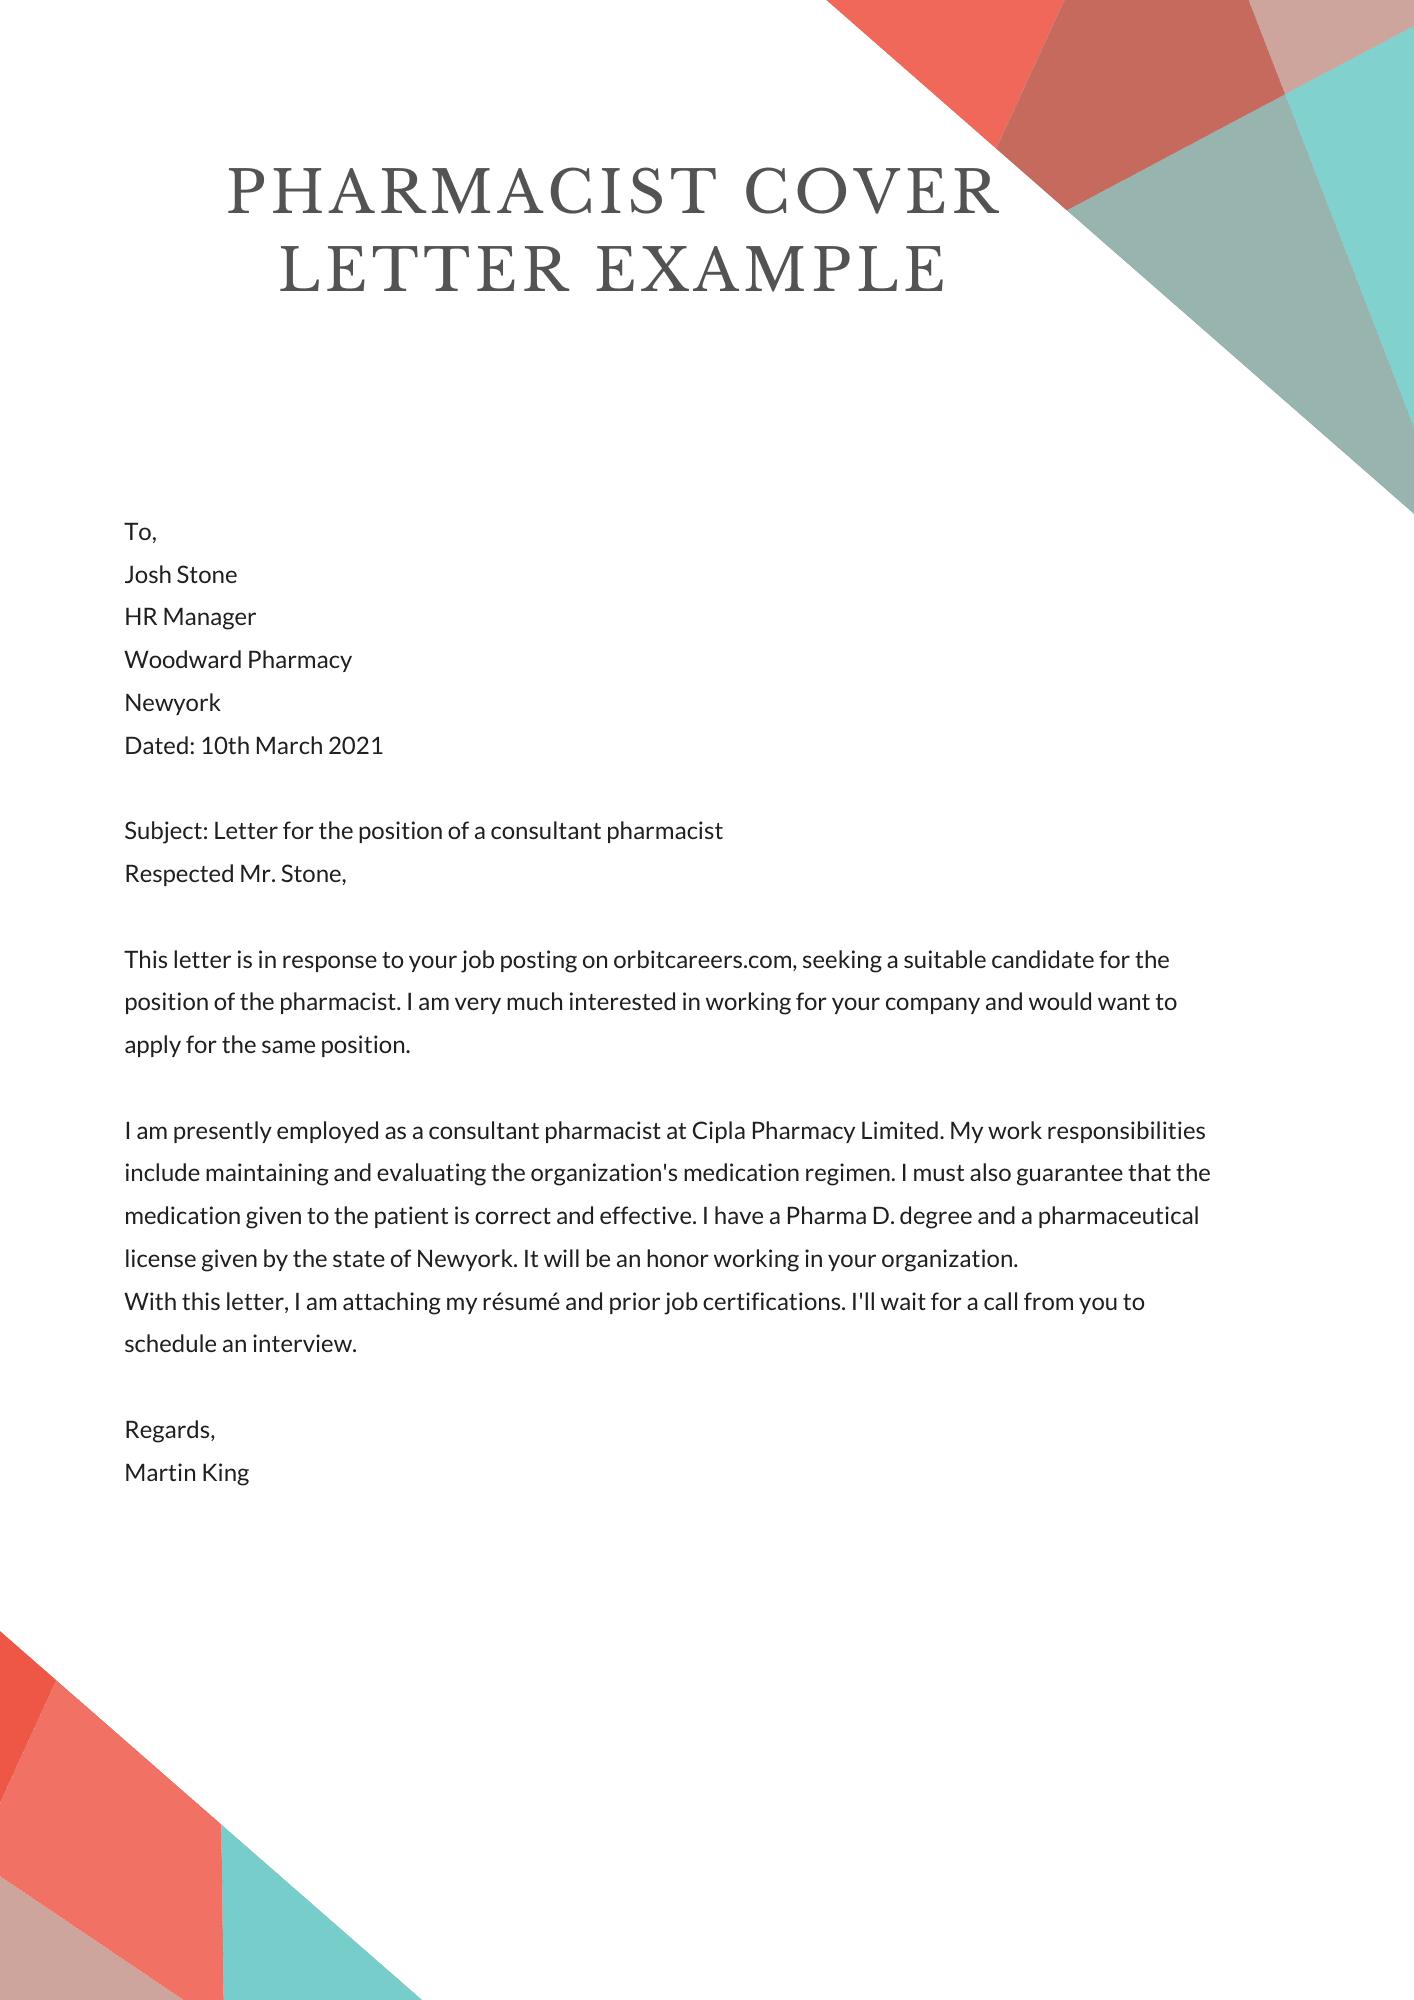 Pharmacist Cover Letter Examples